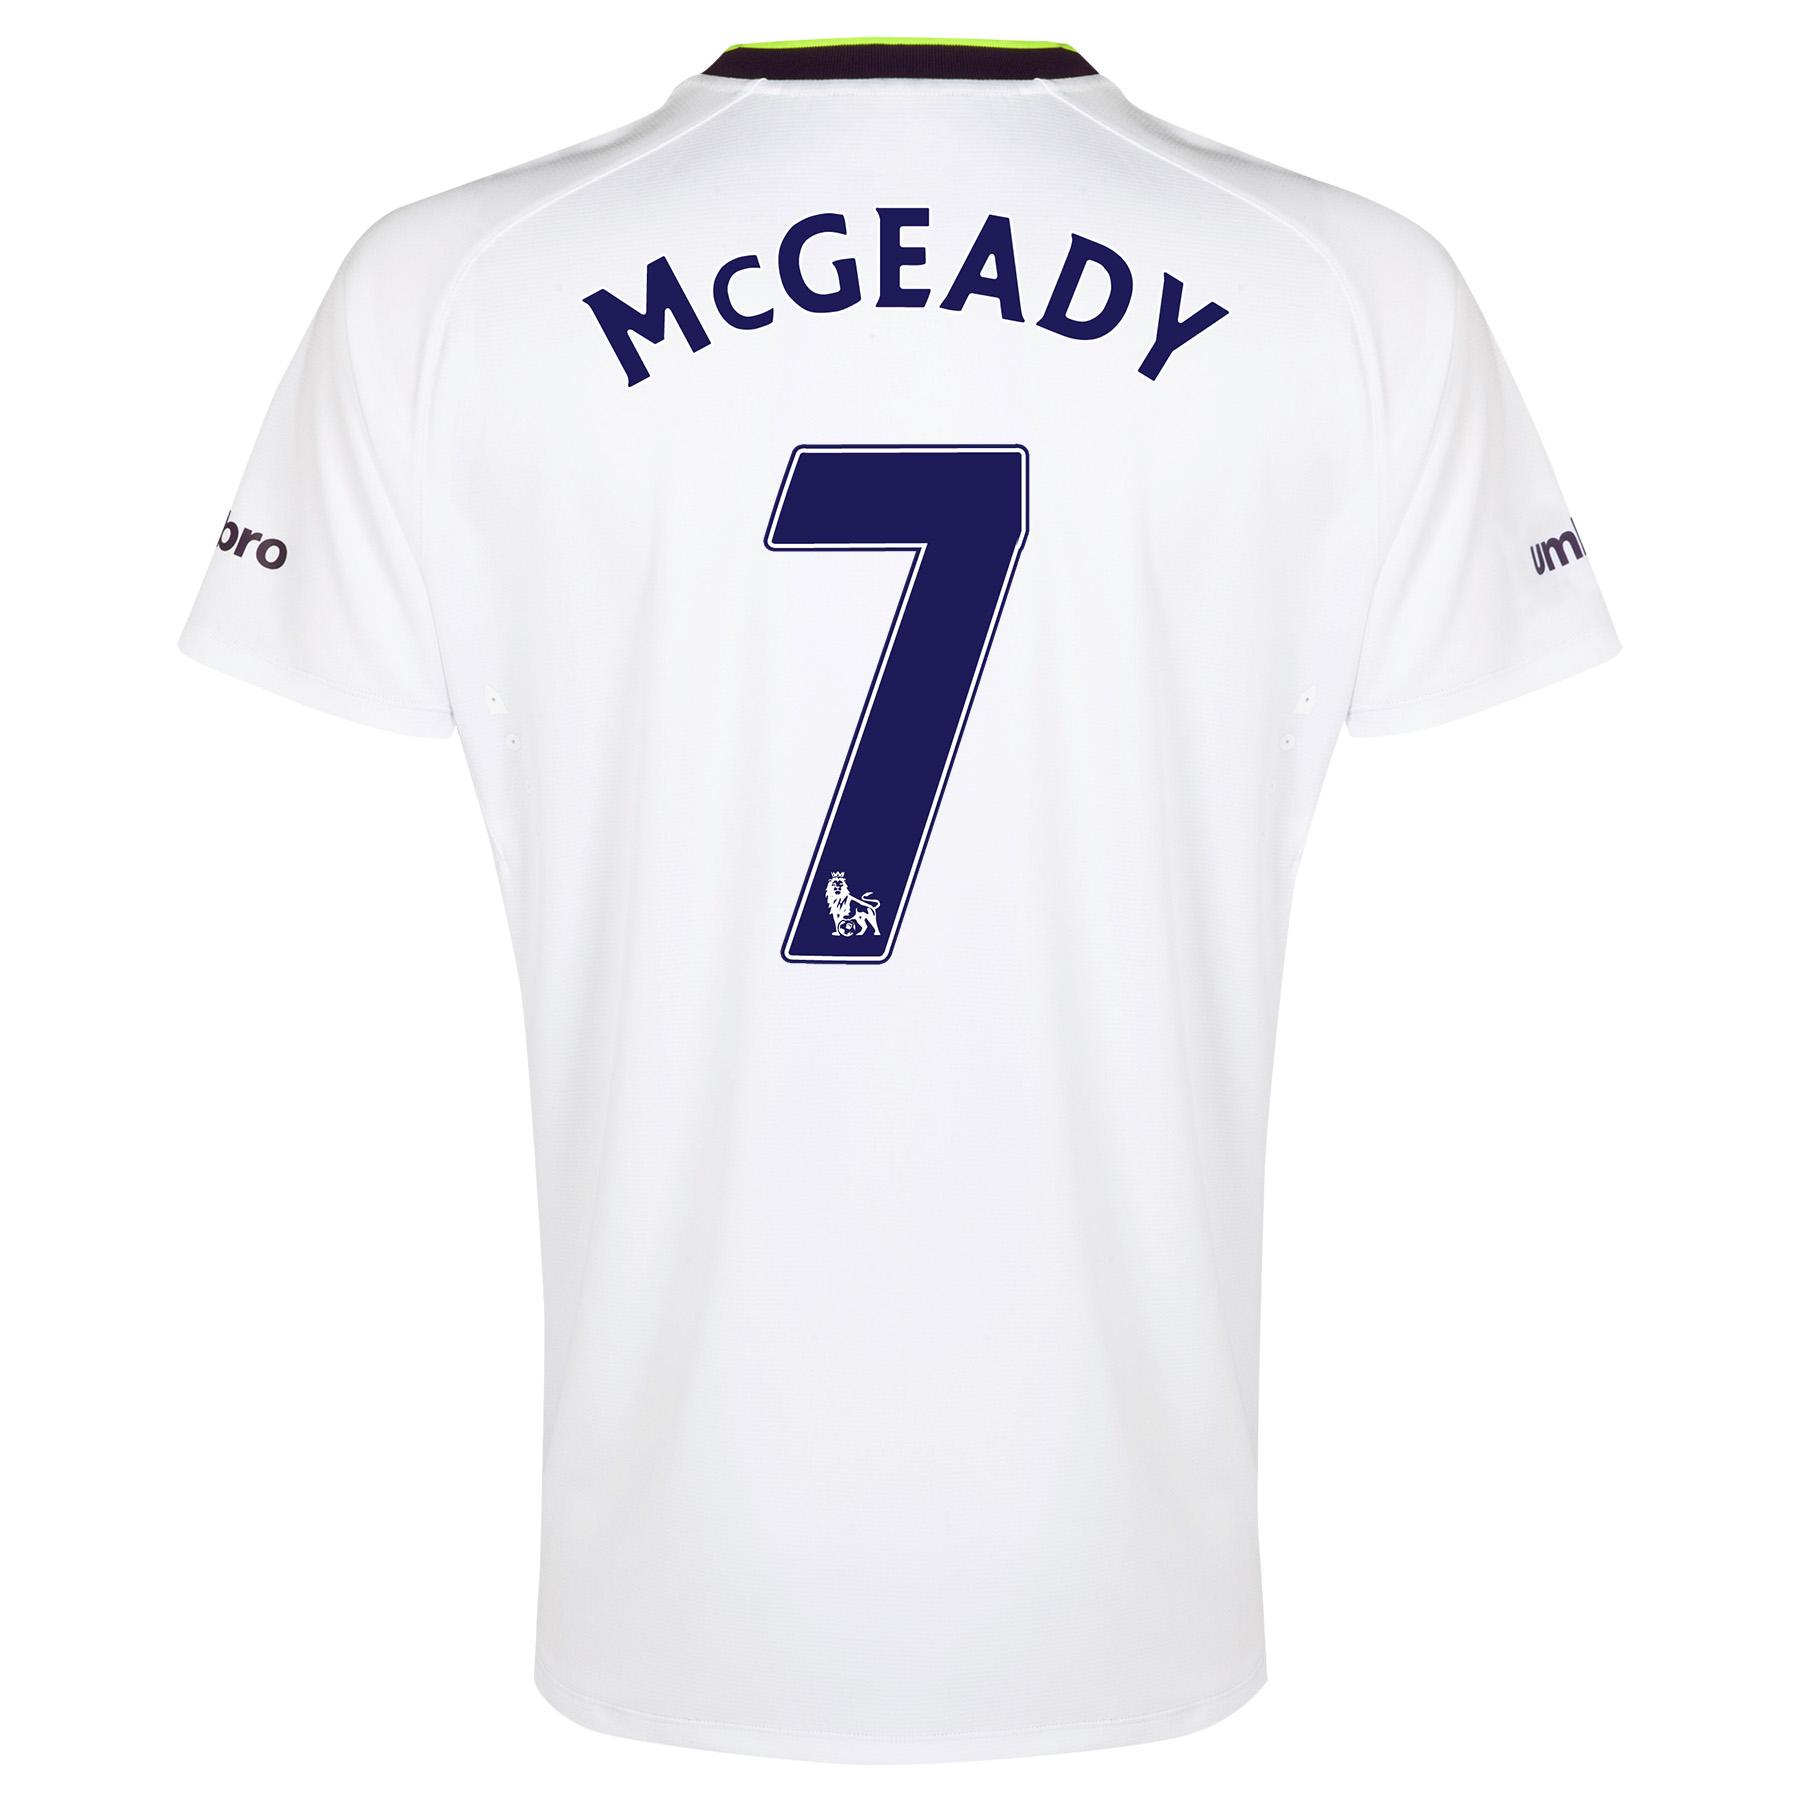 Everton SS 3rd Shirt  2014/15 with McGeady 7 printing